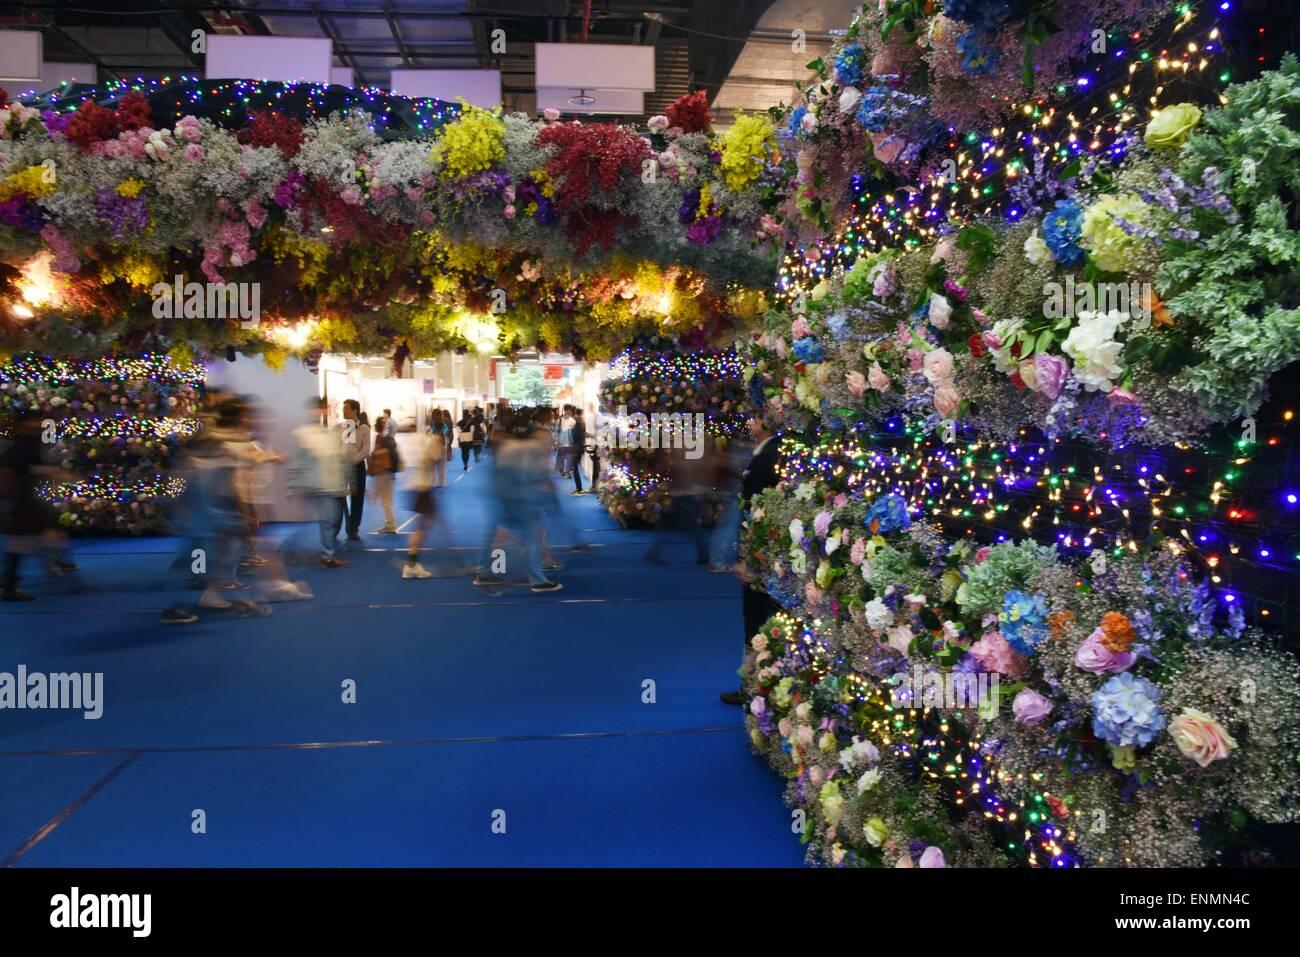 Taipei's Taiwan. 8th May, 2015. People visit the Art Revolution Taipei 2015 at the World Trade Center Hall 3 - Stock Image